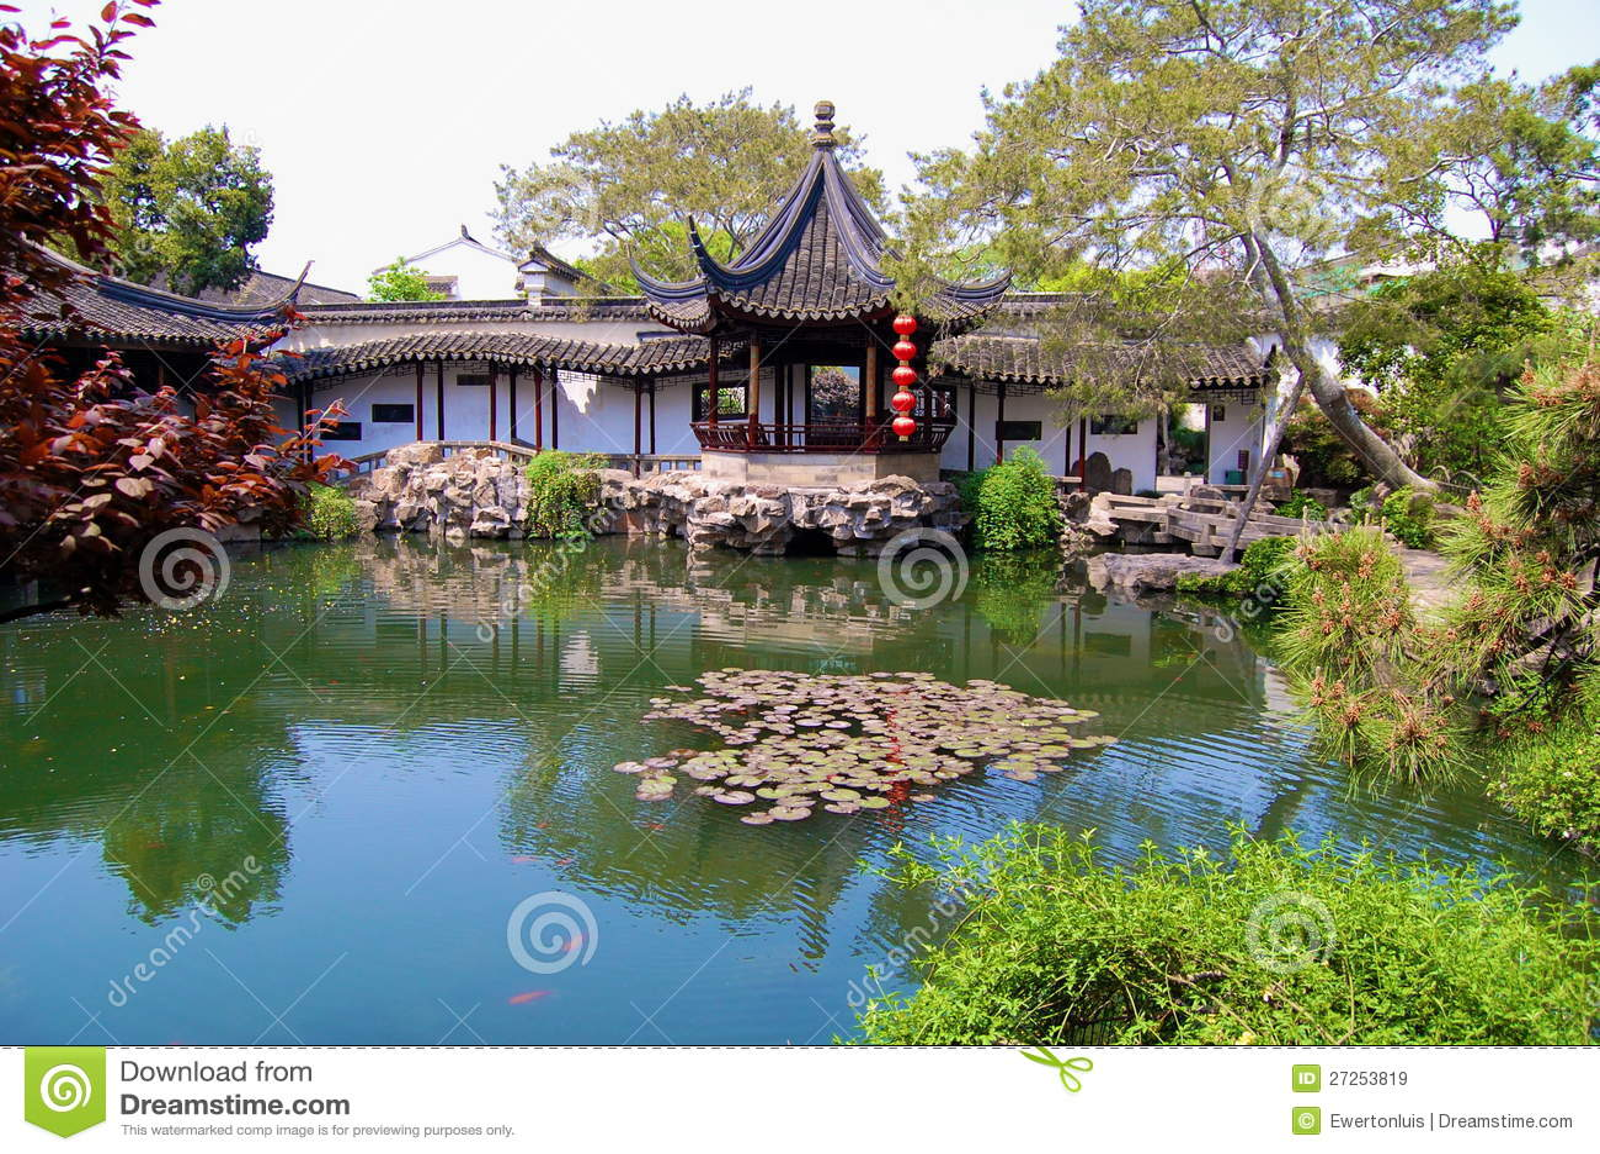 Jardines chinos imagen de archivo imagen de gardening for Jardines chinos pequenos